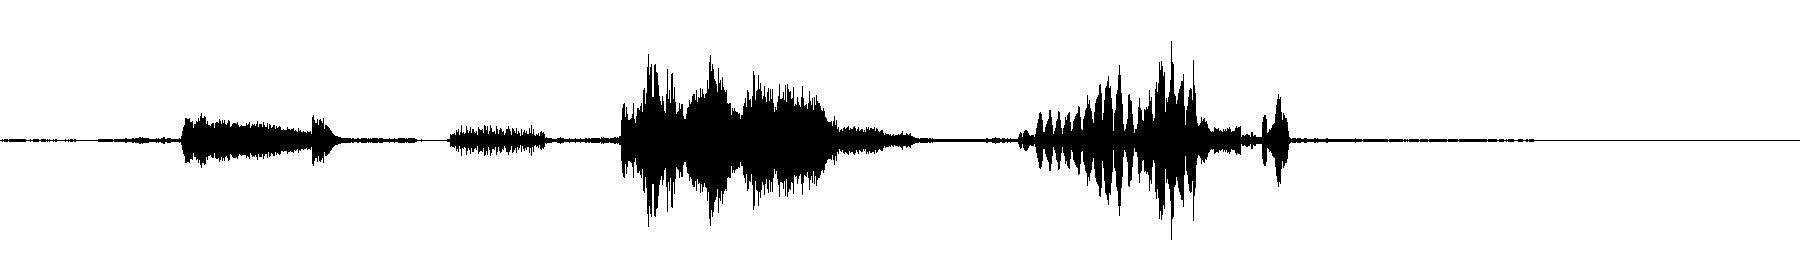 atmos 2